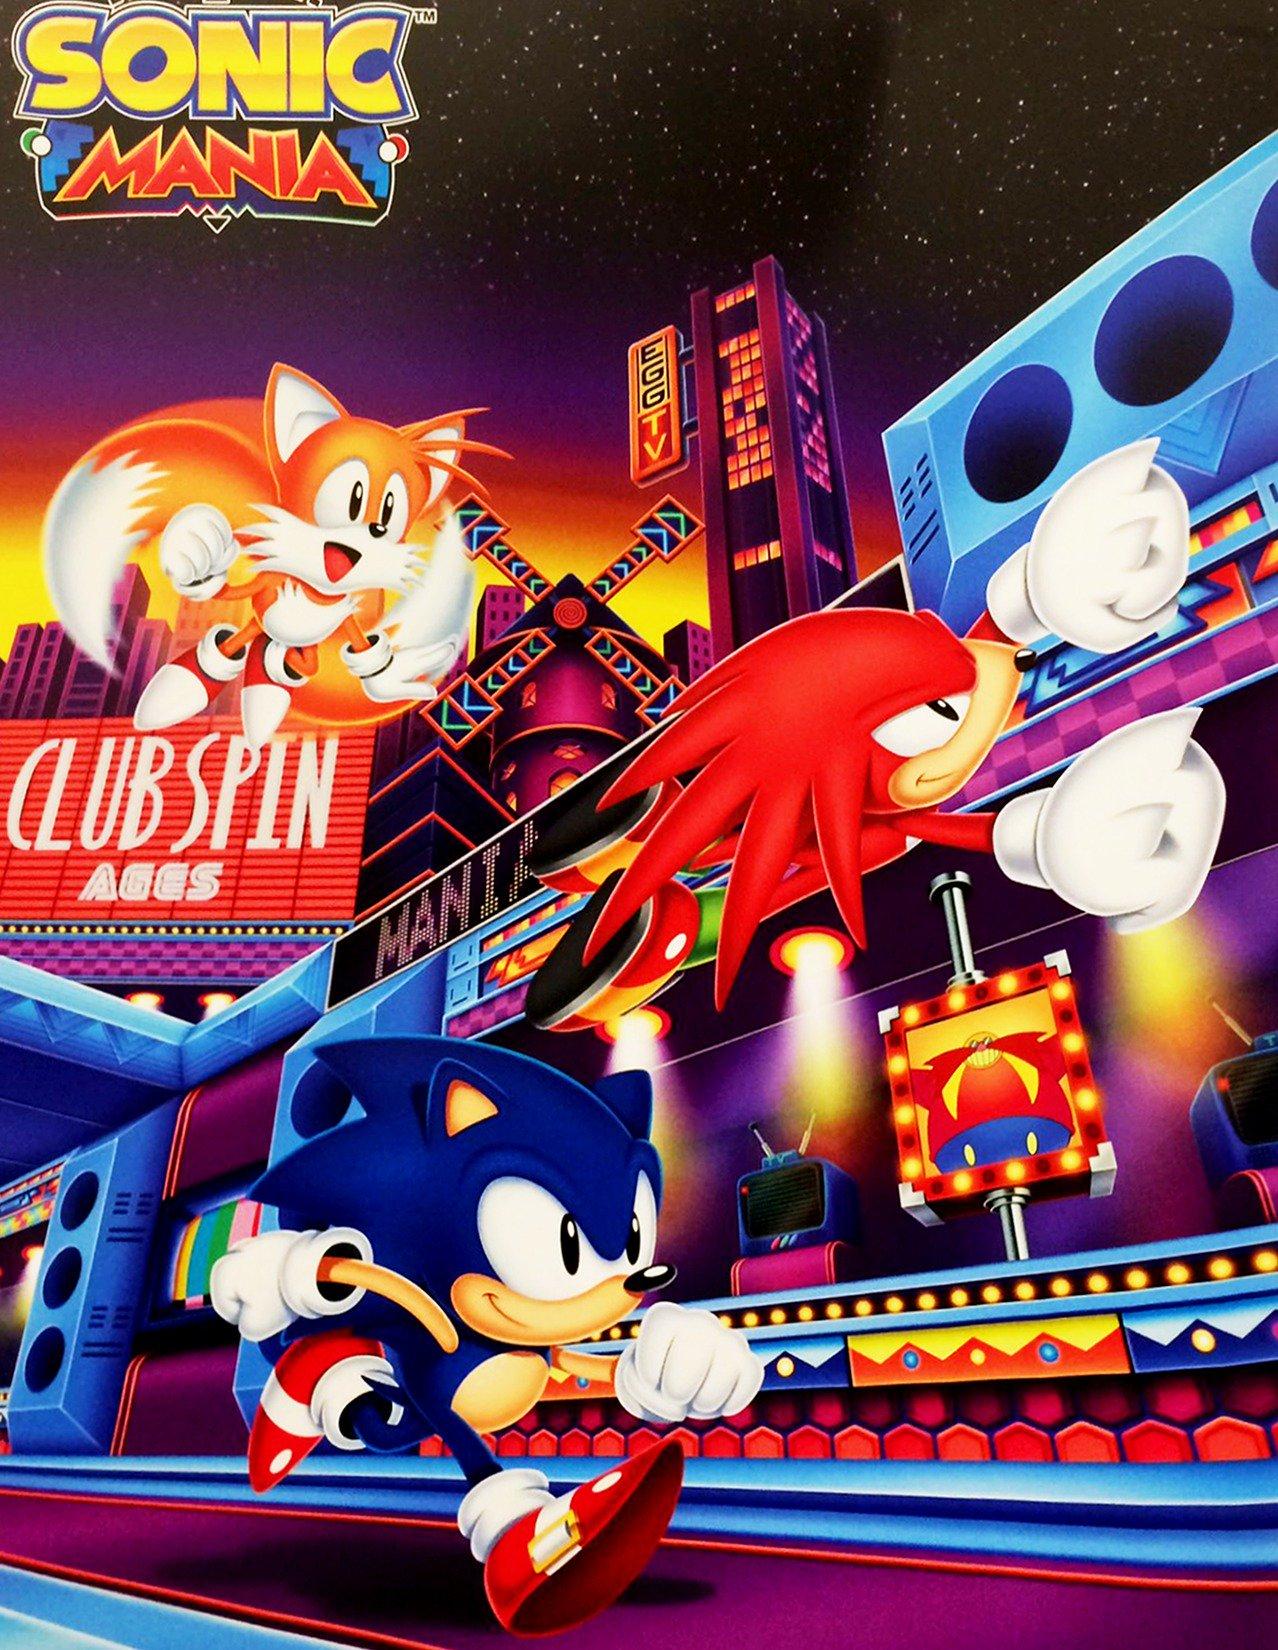 http://rozup.ir/view/2173831/Sonic-Mania-poster-artwork.jpg